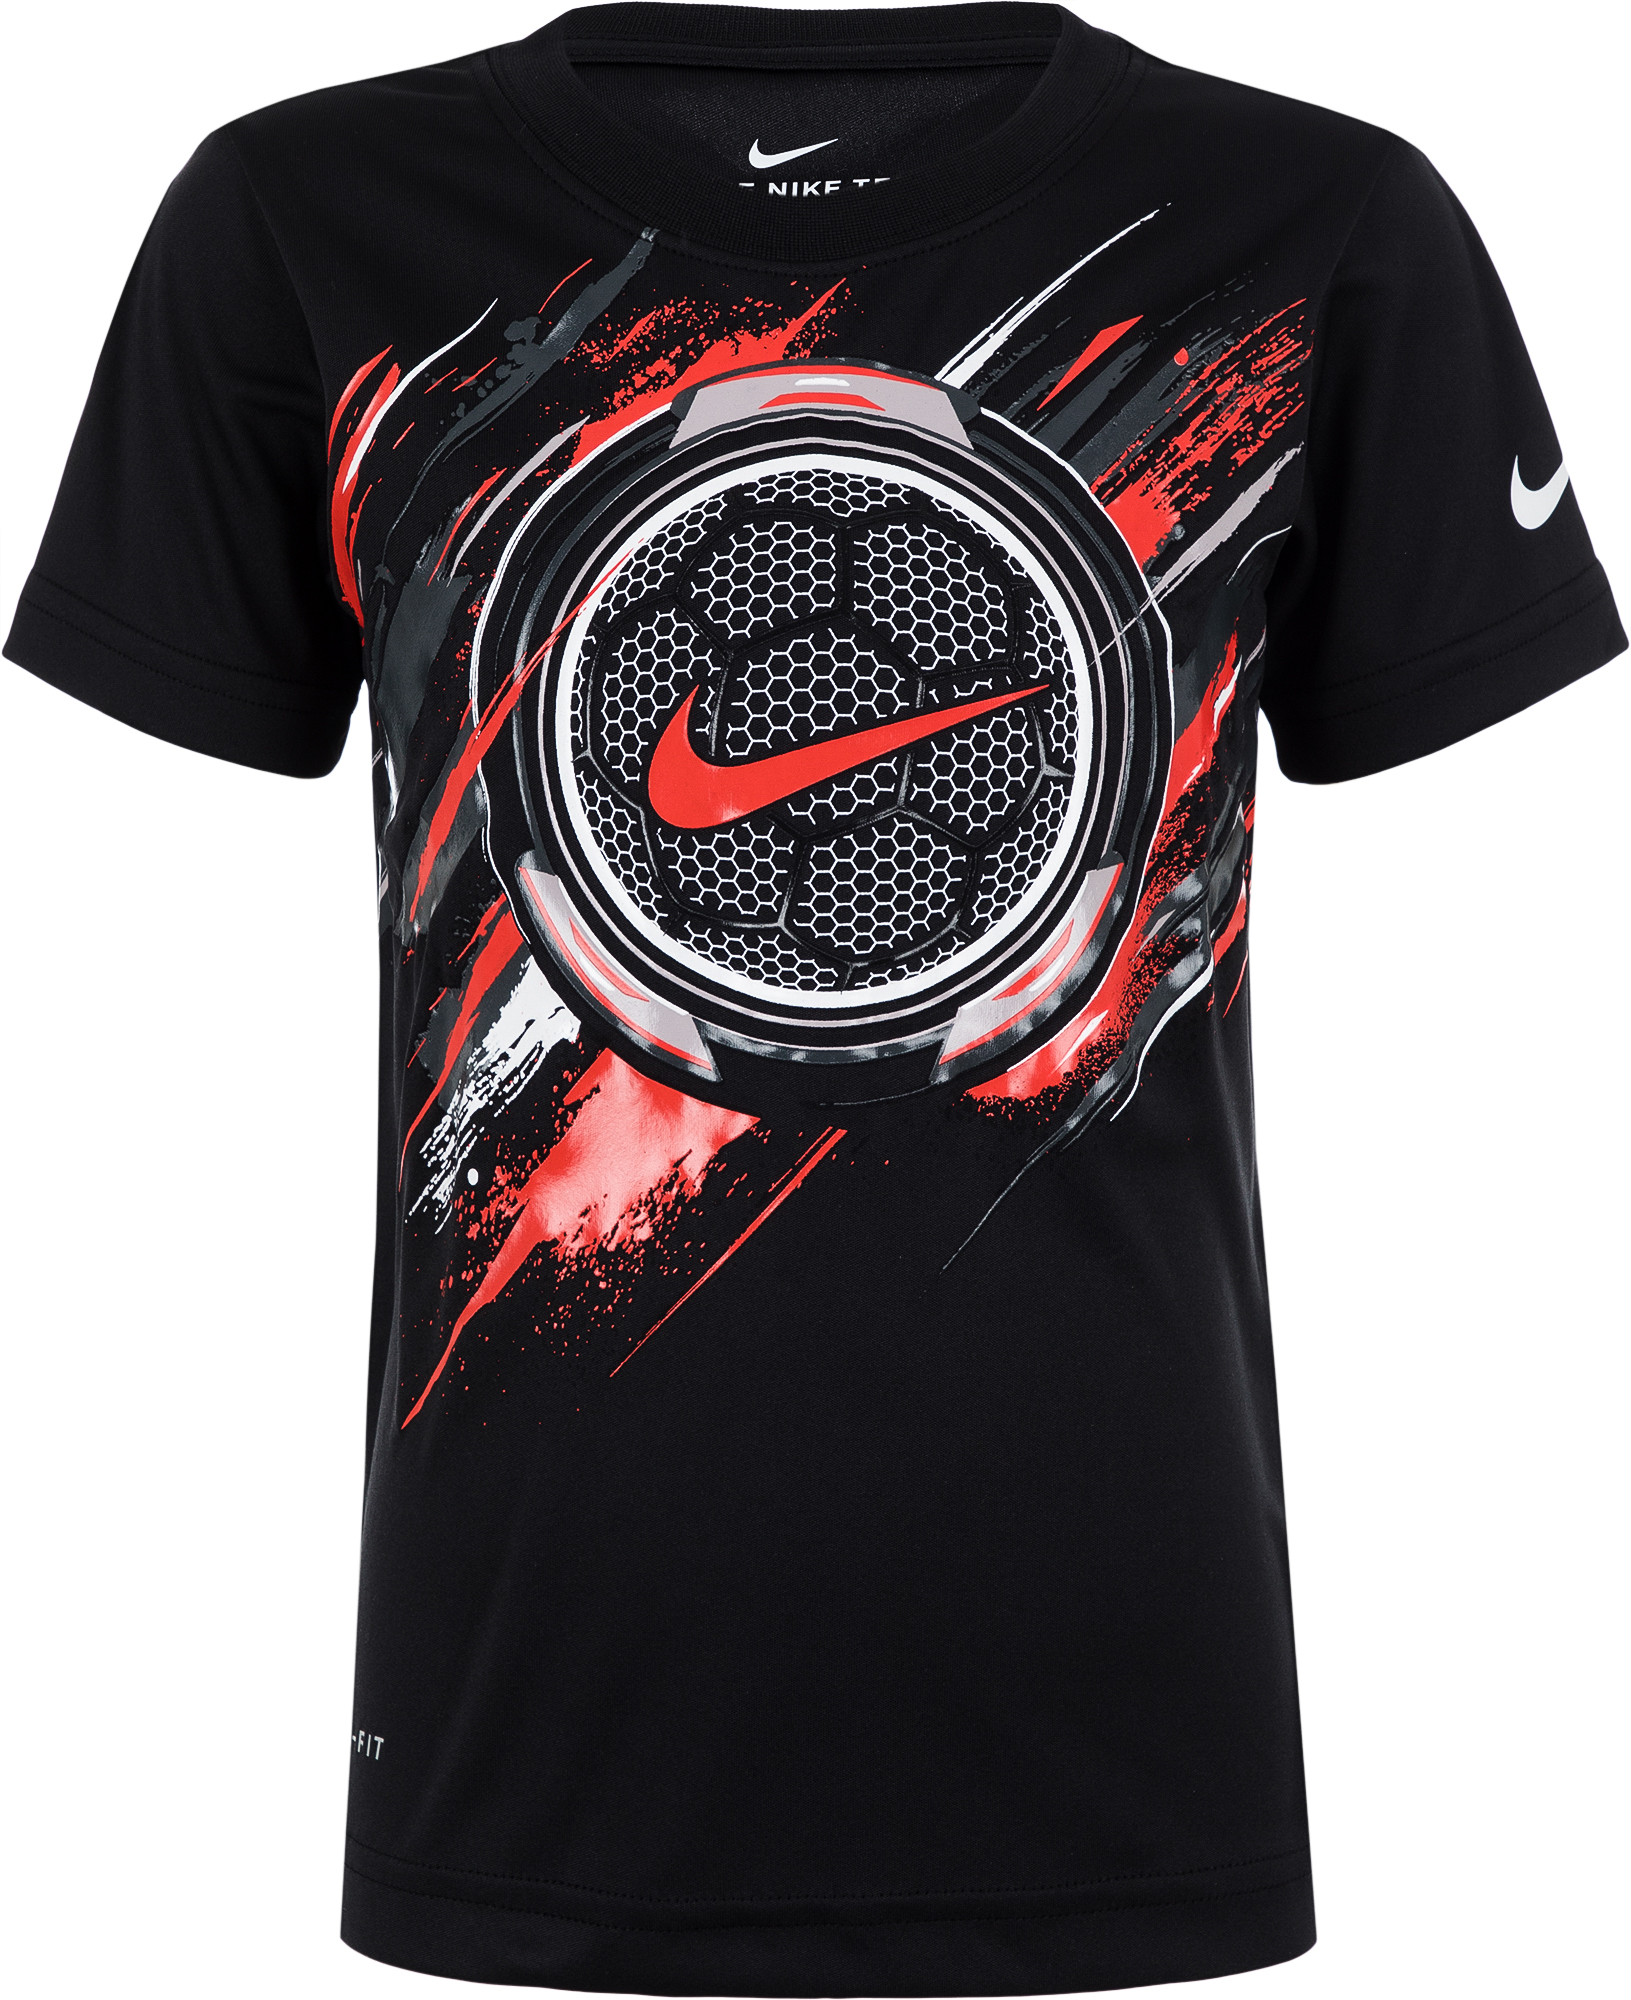 Nike Футболка для мальчиков Nike, размер 122